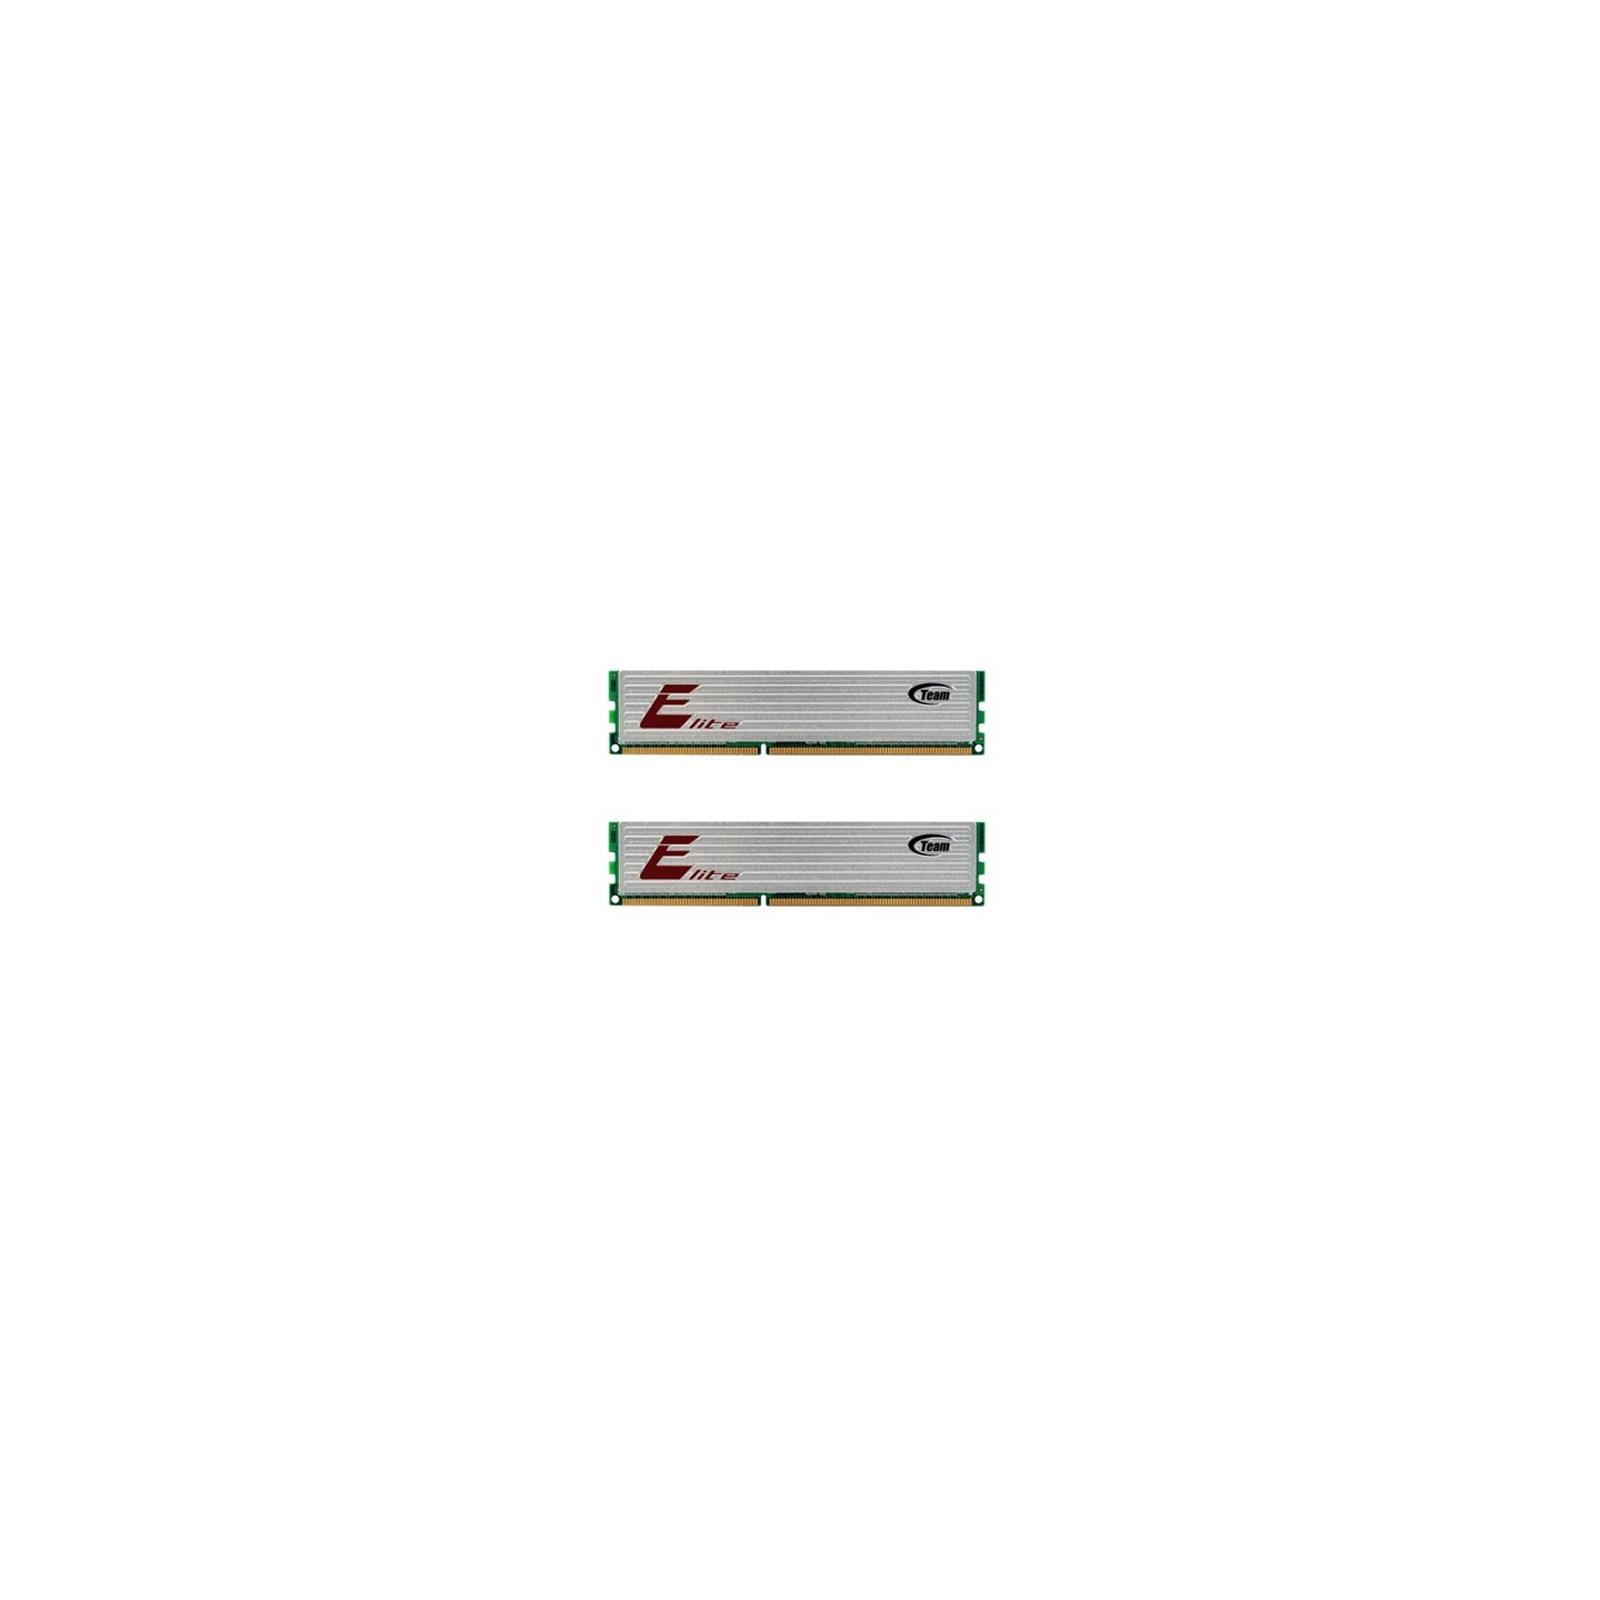 Модуль памяти для компьютера DDR3 4GB (2x2GB) 1600 MHz Team (TED34096M1600HC11DC)